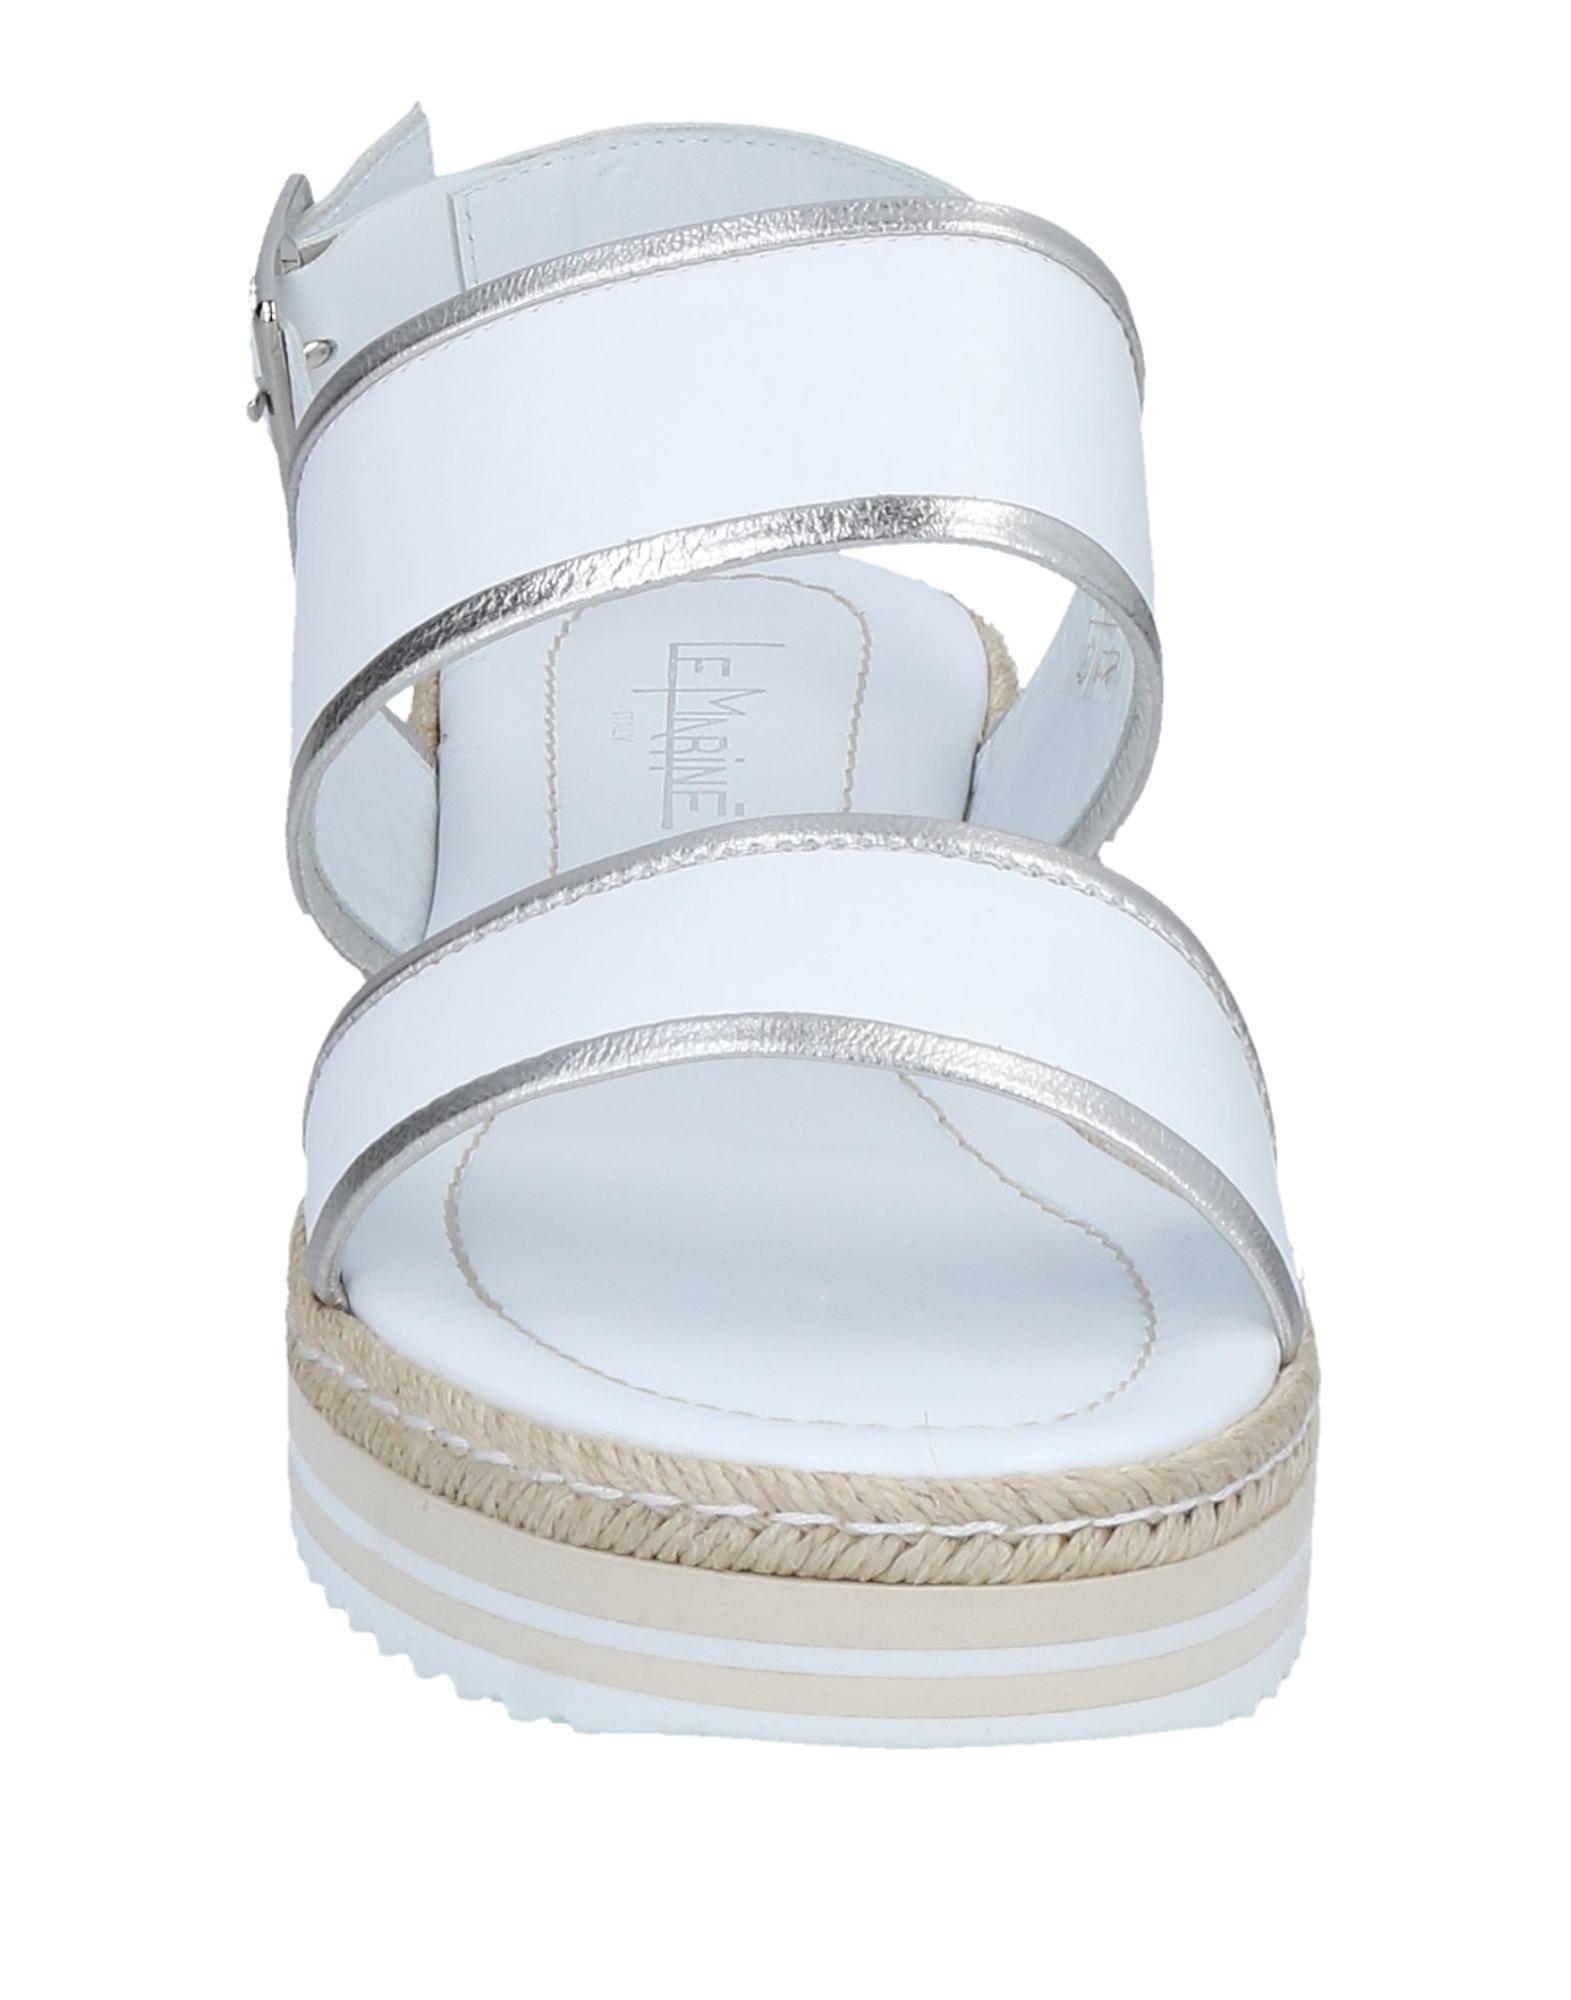 Stilvolle billige Schuhe Damen Le Marinē Sandalen Damen Schuhe  11502961SE 374eb3